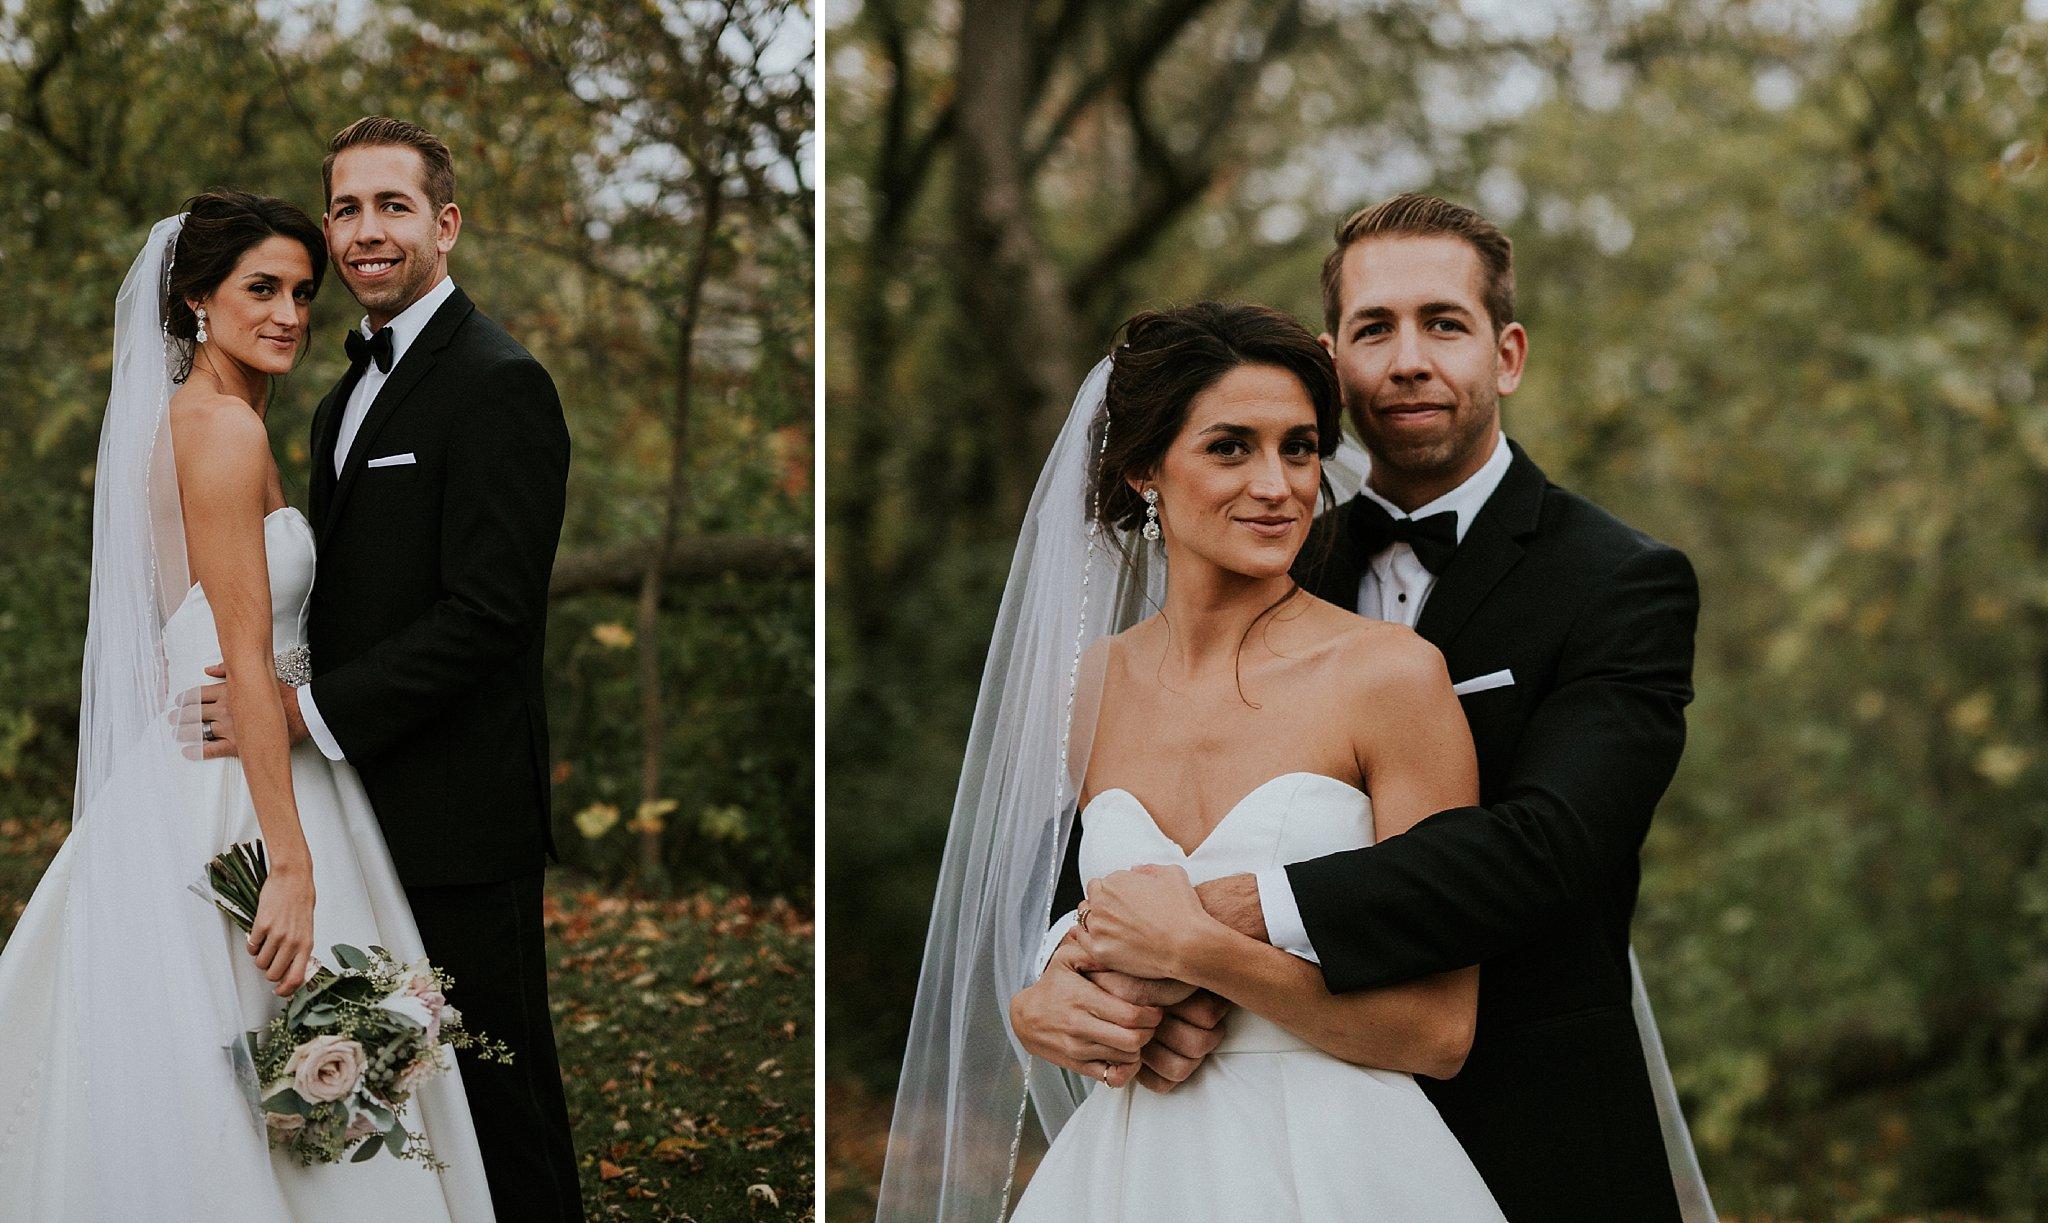 Matt-Lauren_St-Marys_Hilton-City-Center-Milwaukee-Wedding_liller-photo_0041.jpg